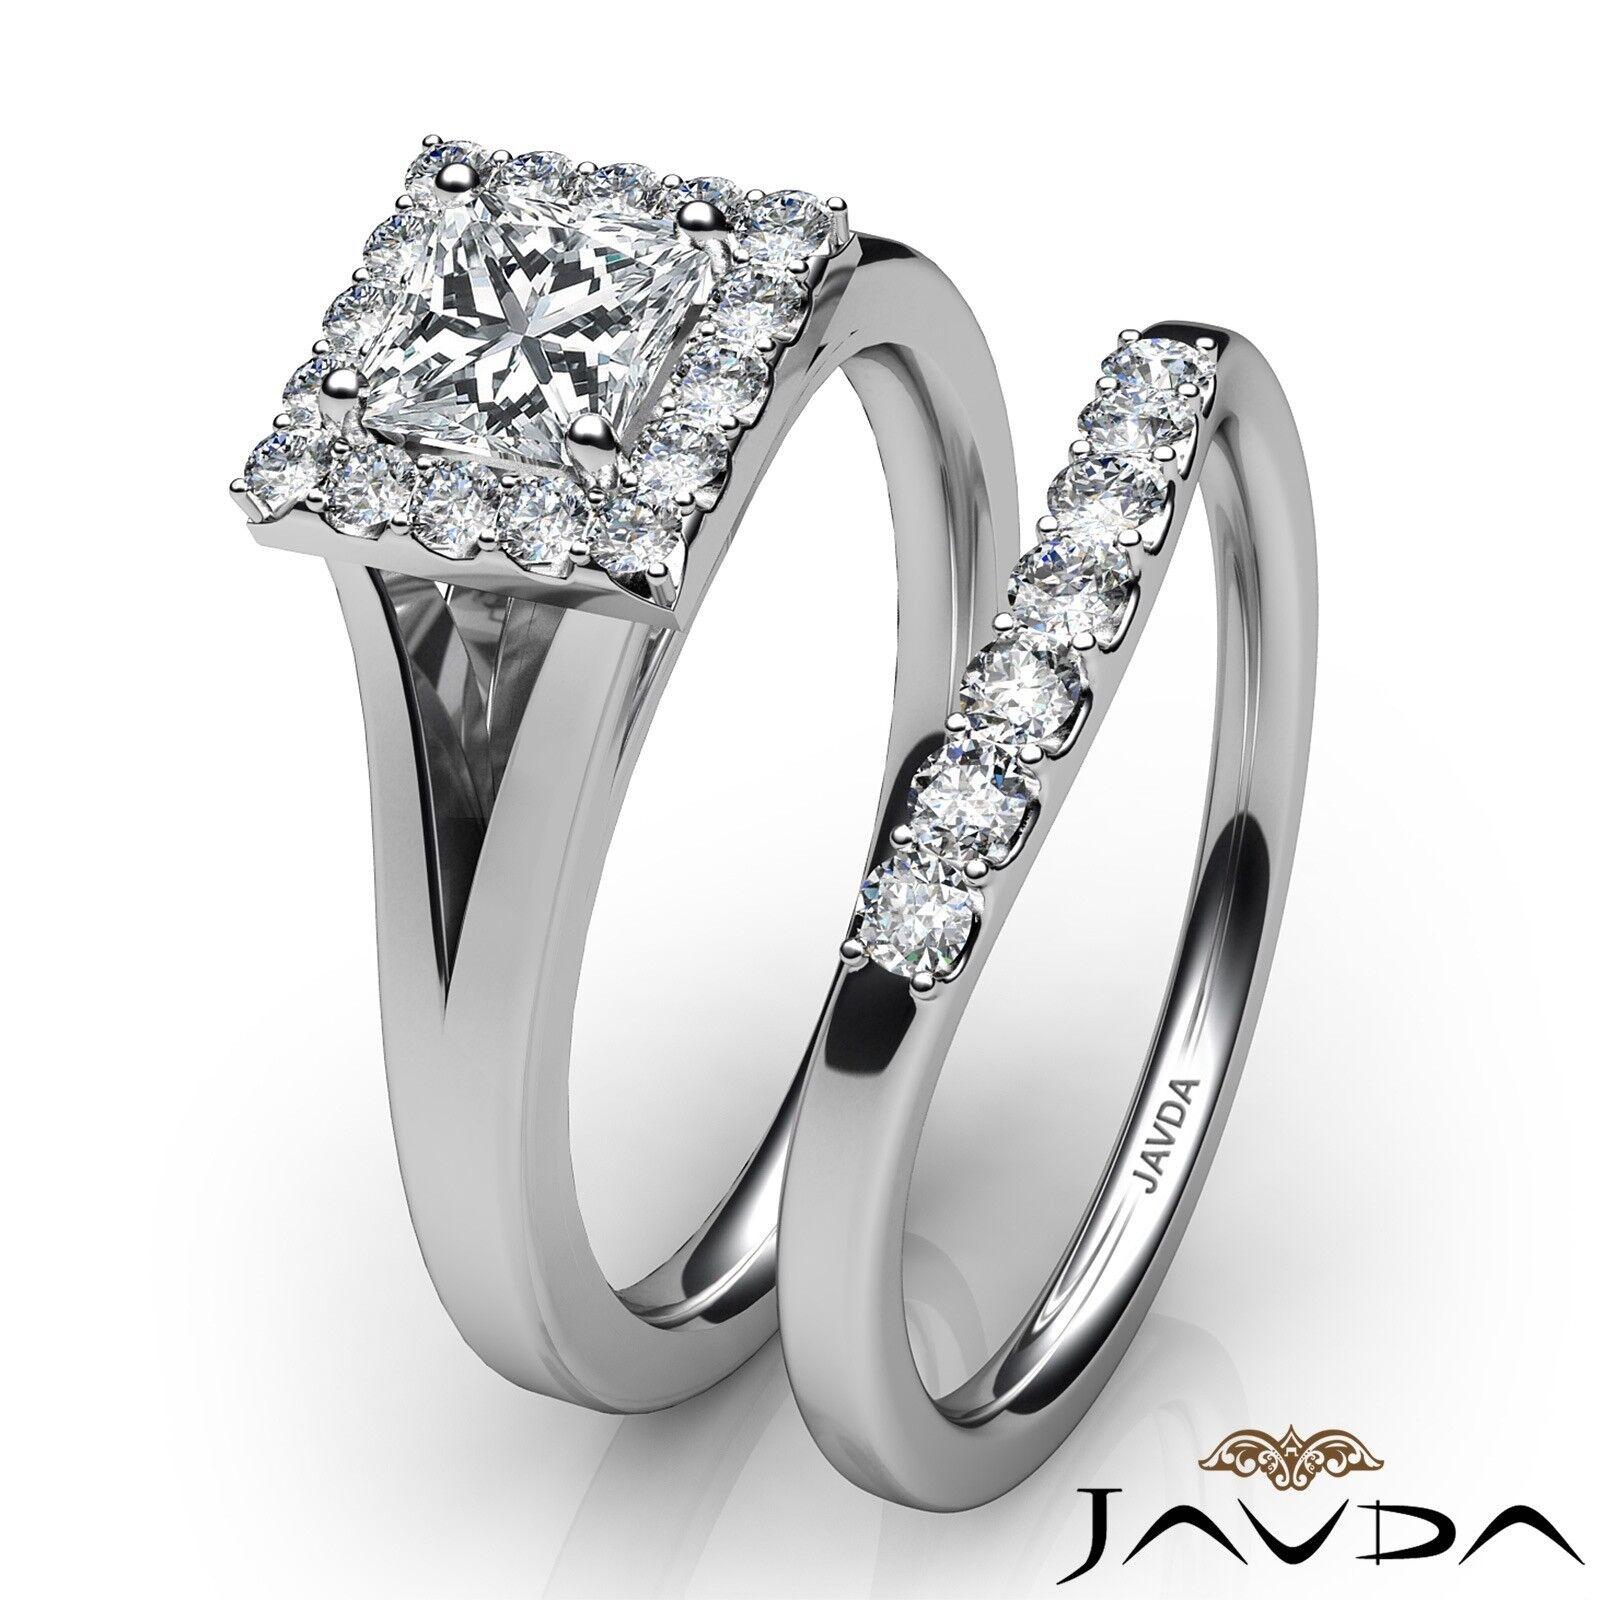 0.93ctw Halo Pave Bridal Princess Diamond Engagement Ring GIA F-VVS1 White Gold 3